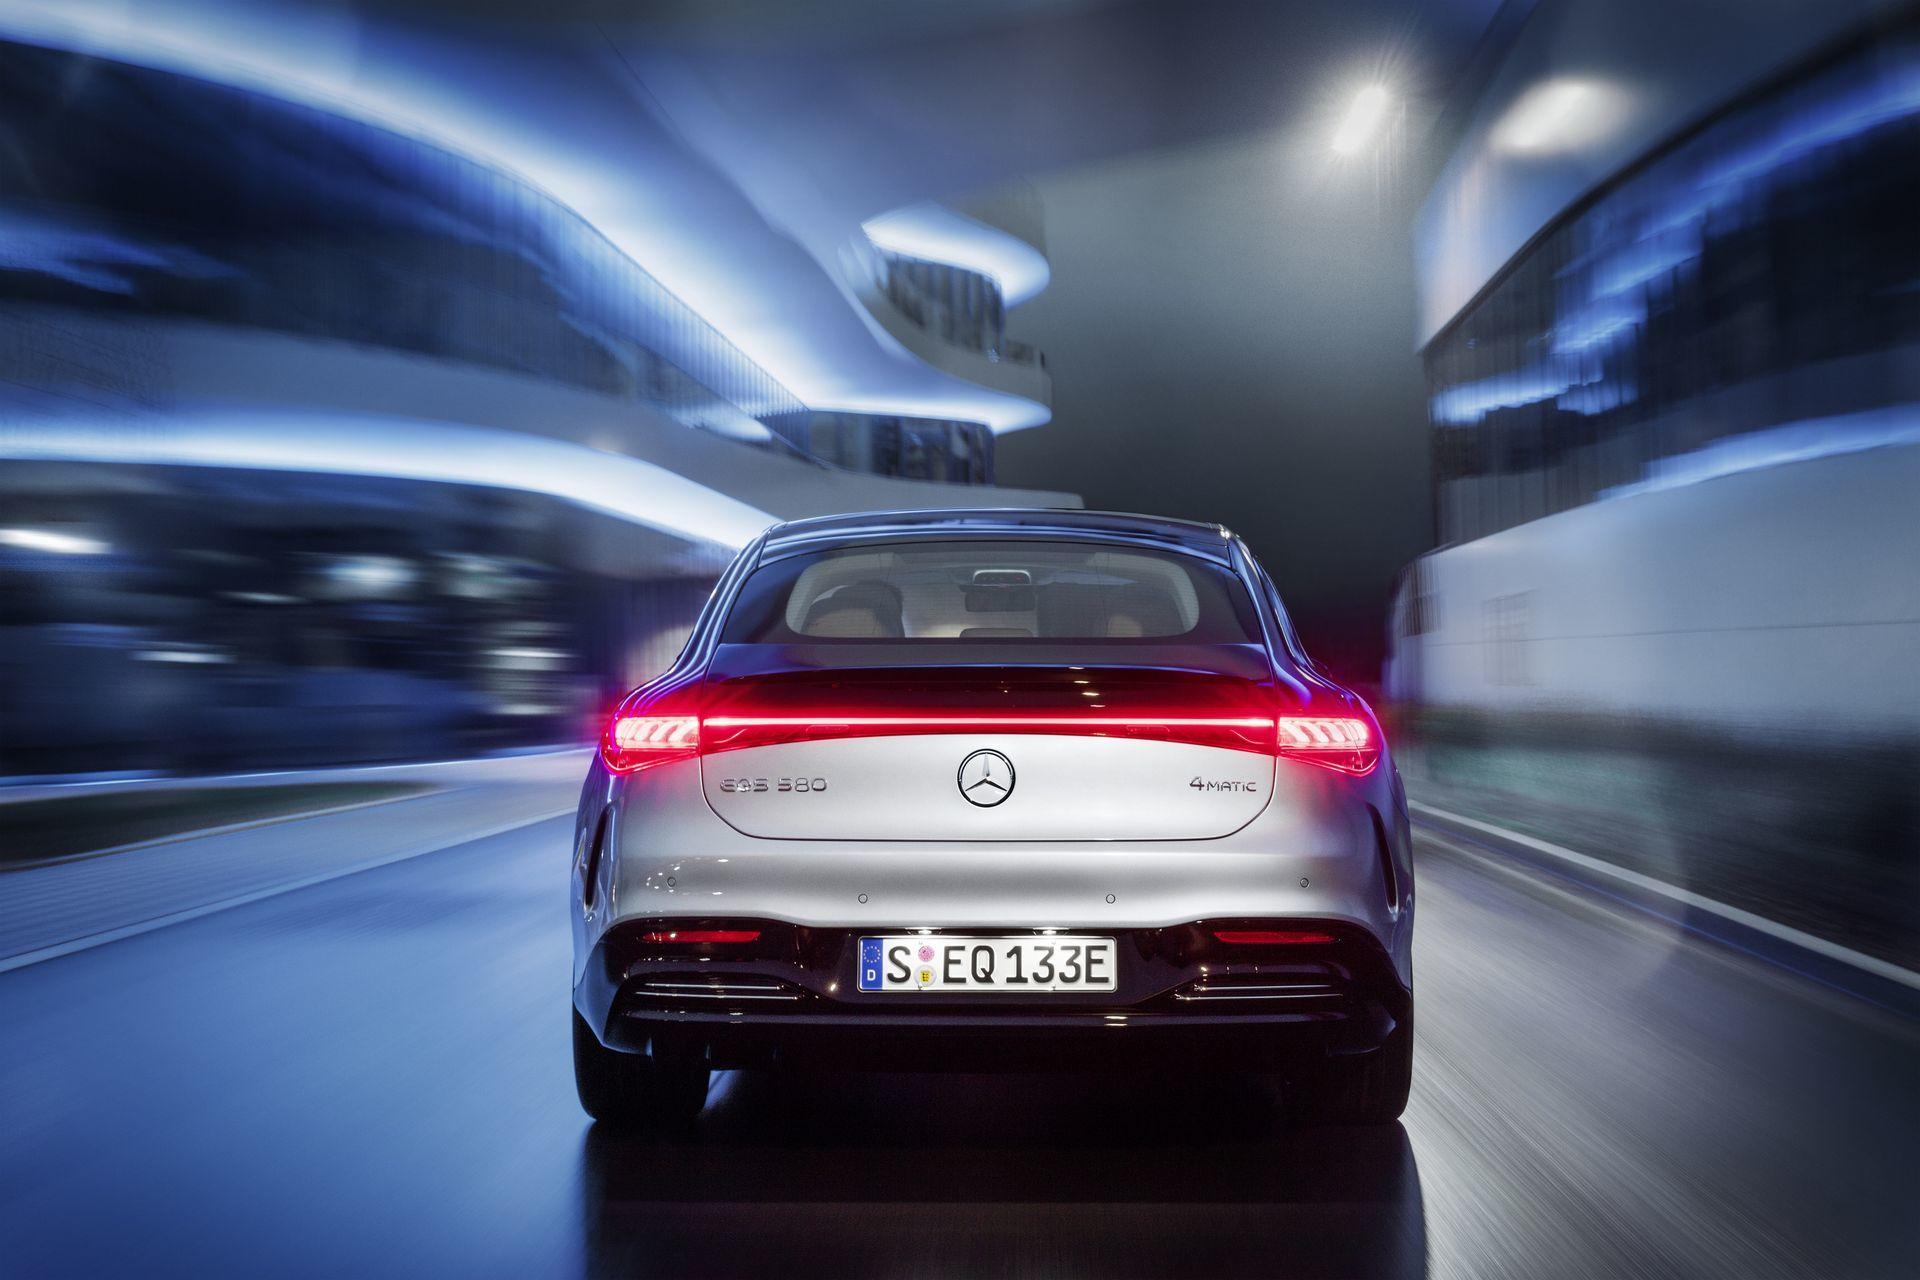 Mercedes Eq, Eqs 580 4matic Mercedes Eq, Eqs 580 4matic